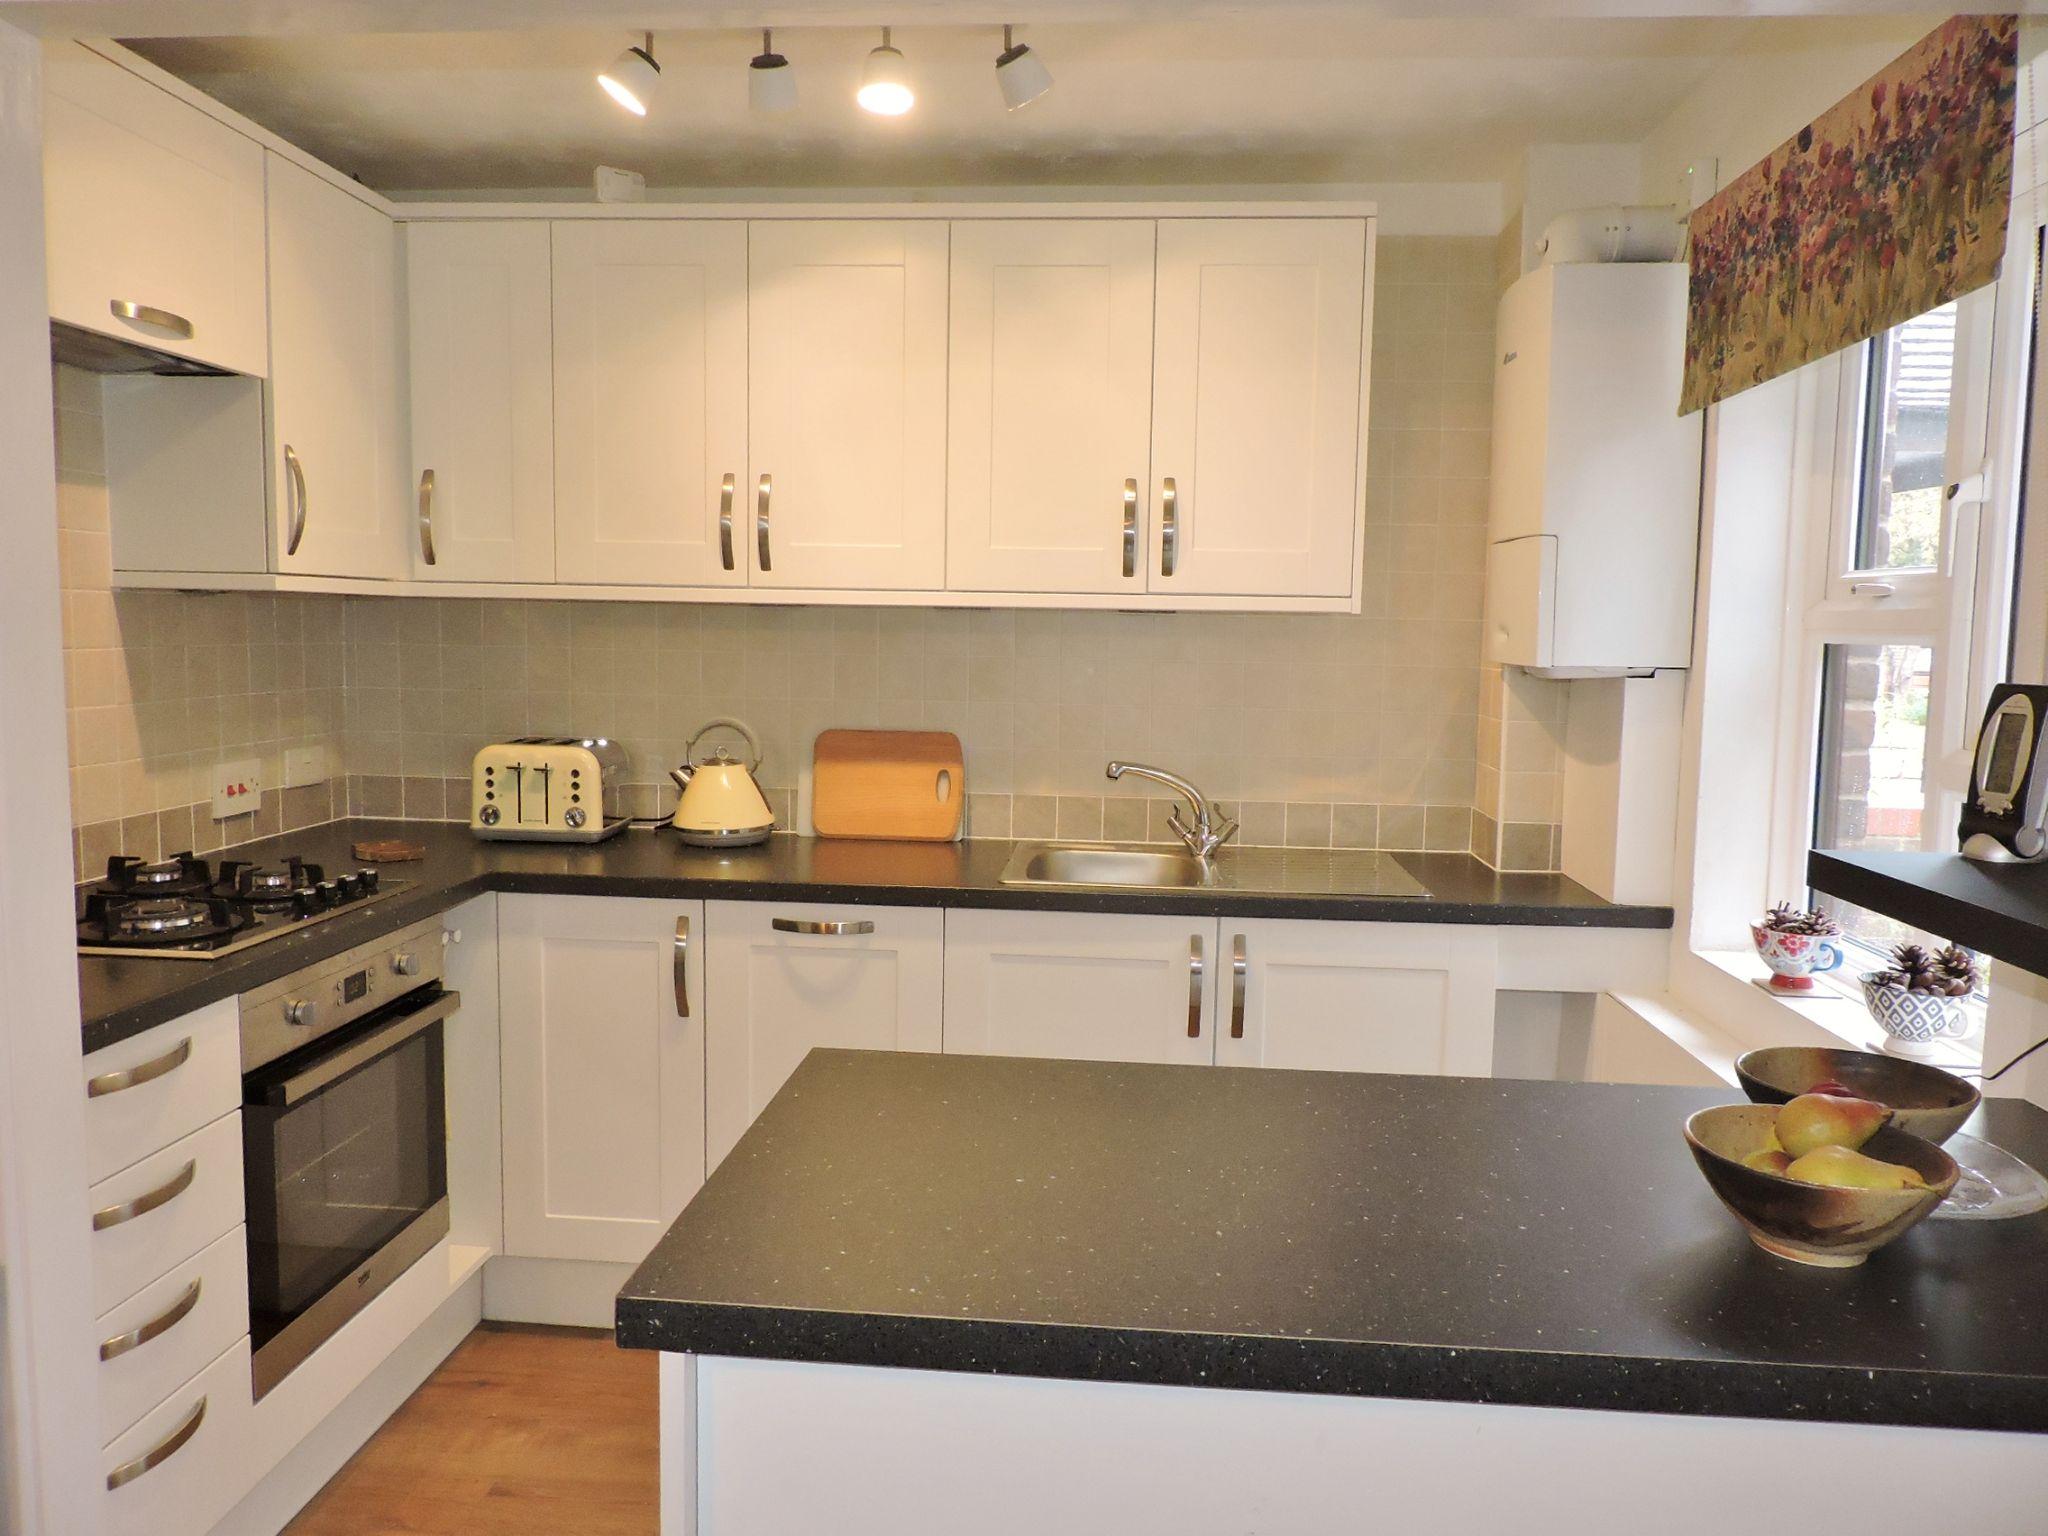 1 bedroom ground floor maisonette flat/apartment Sale Agreed in New Malden - Photograph 4